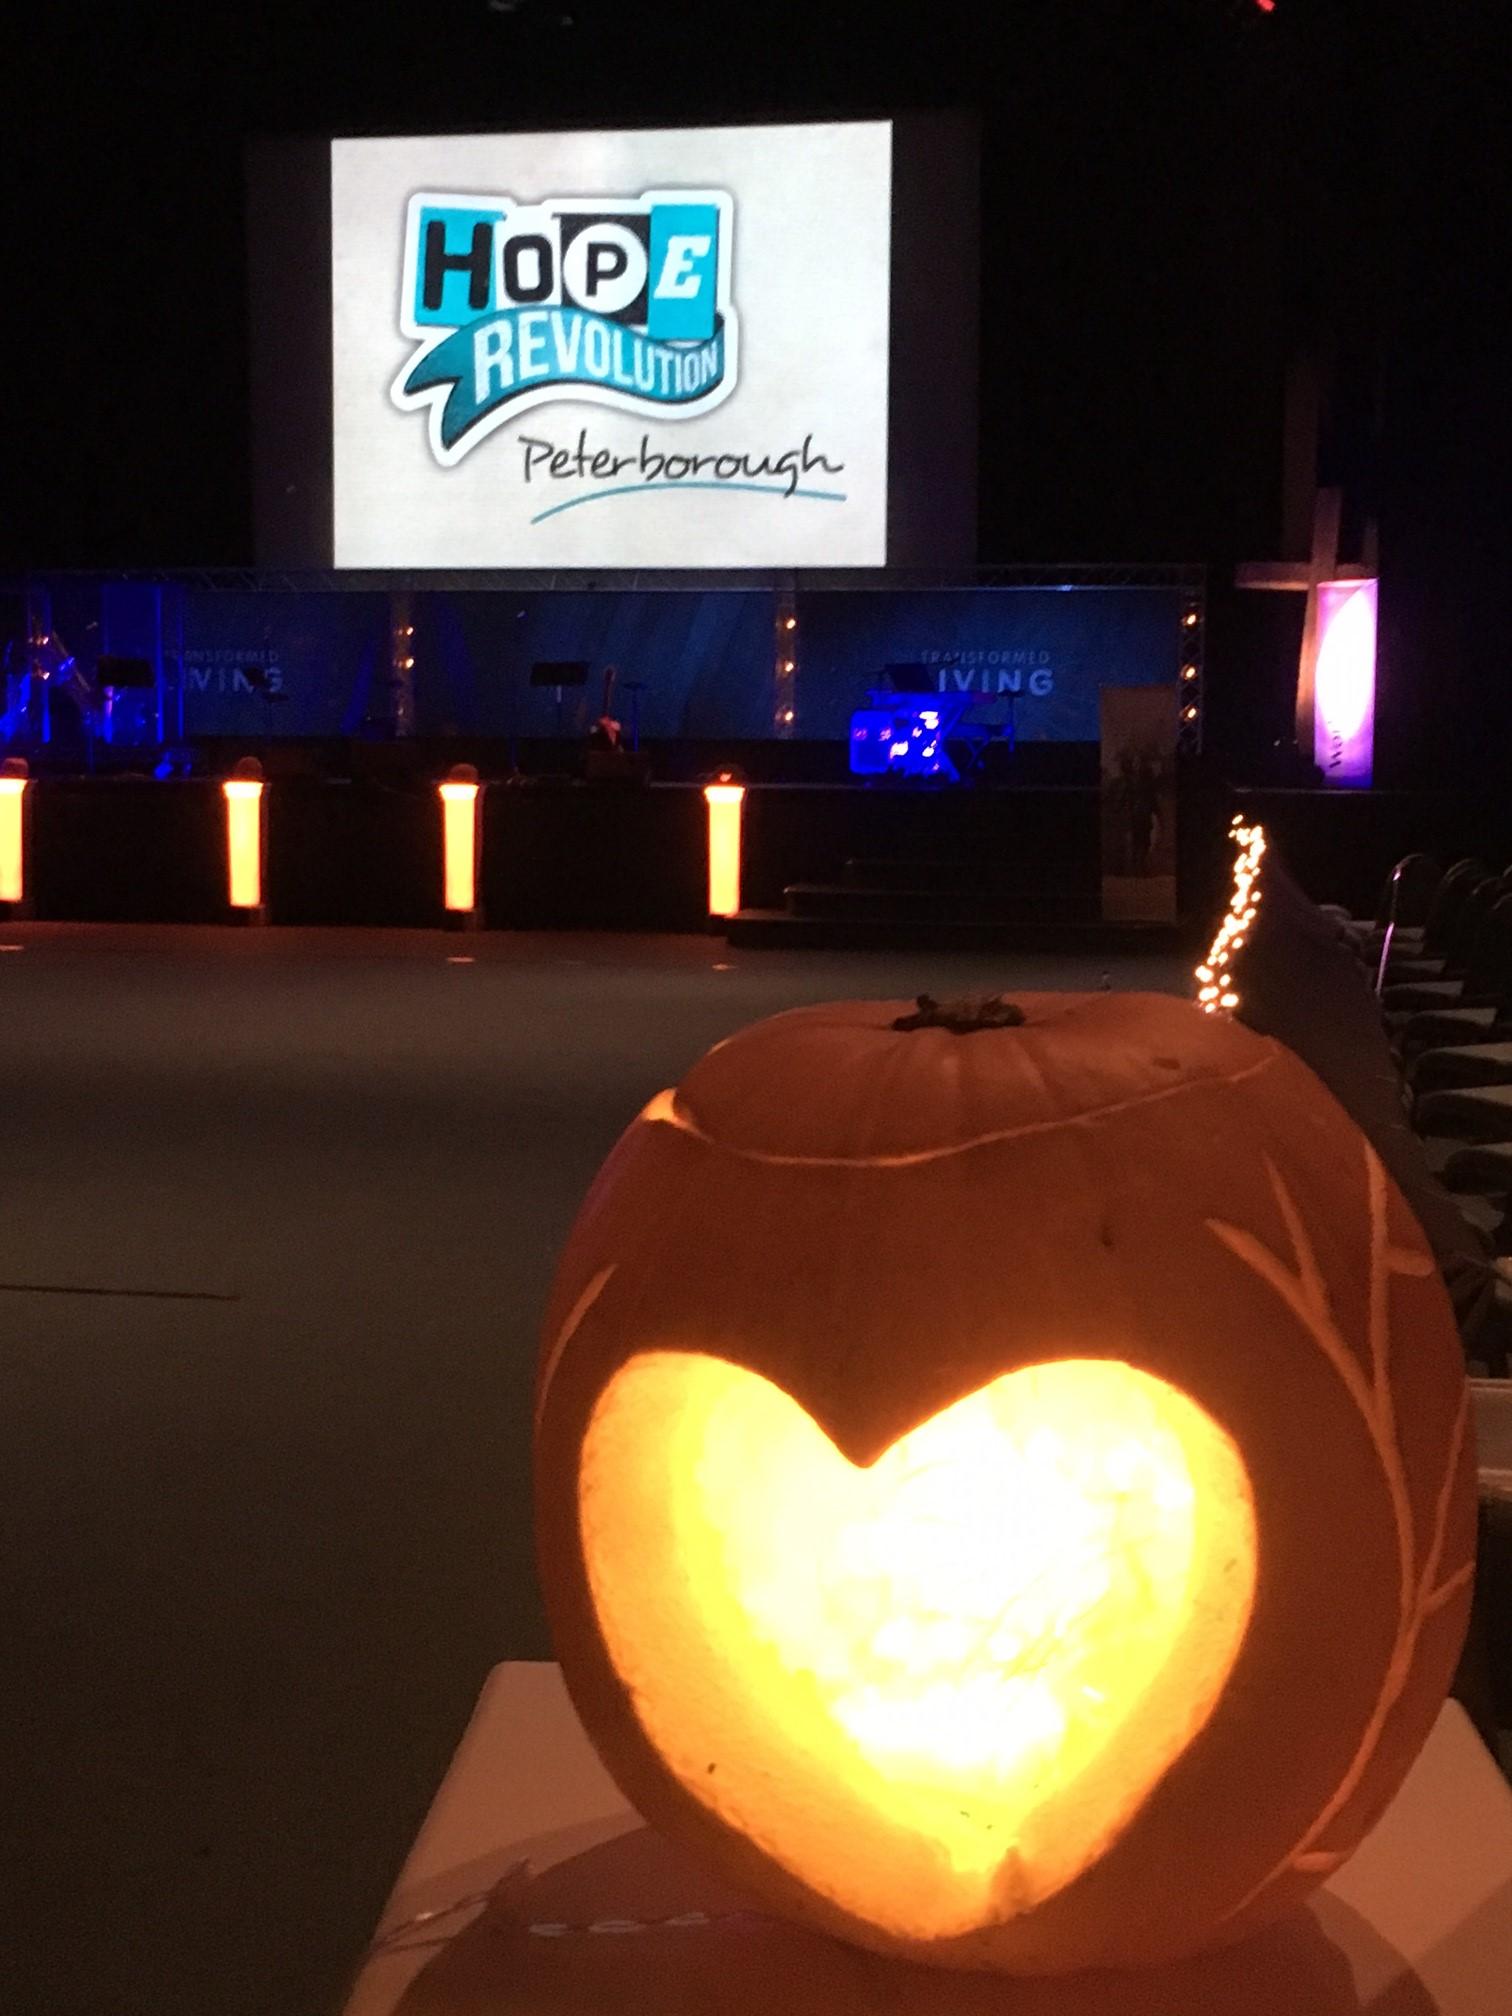 Carve a Heart proves huge success